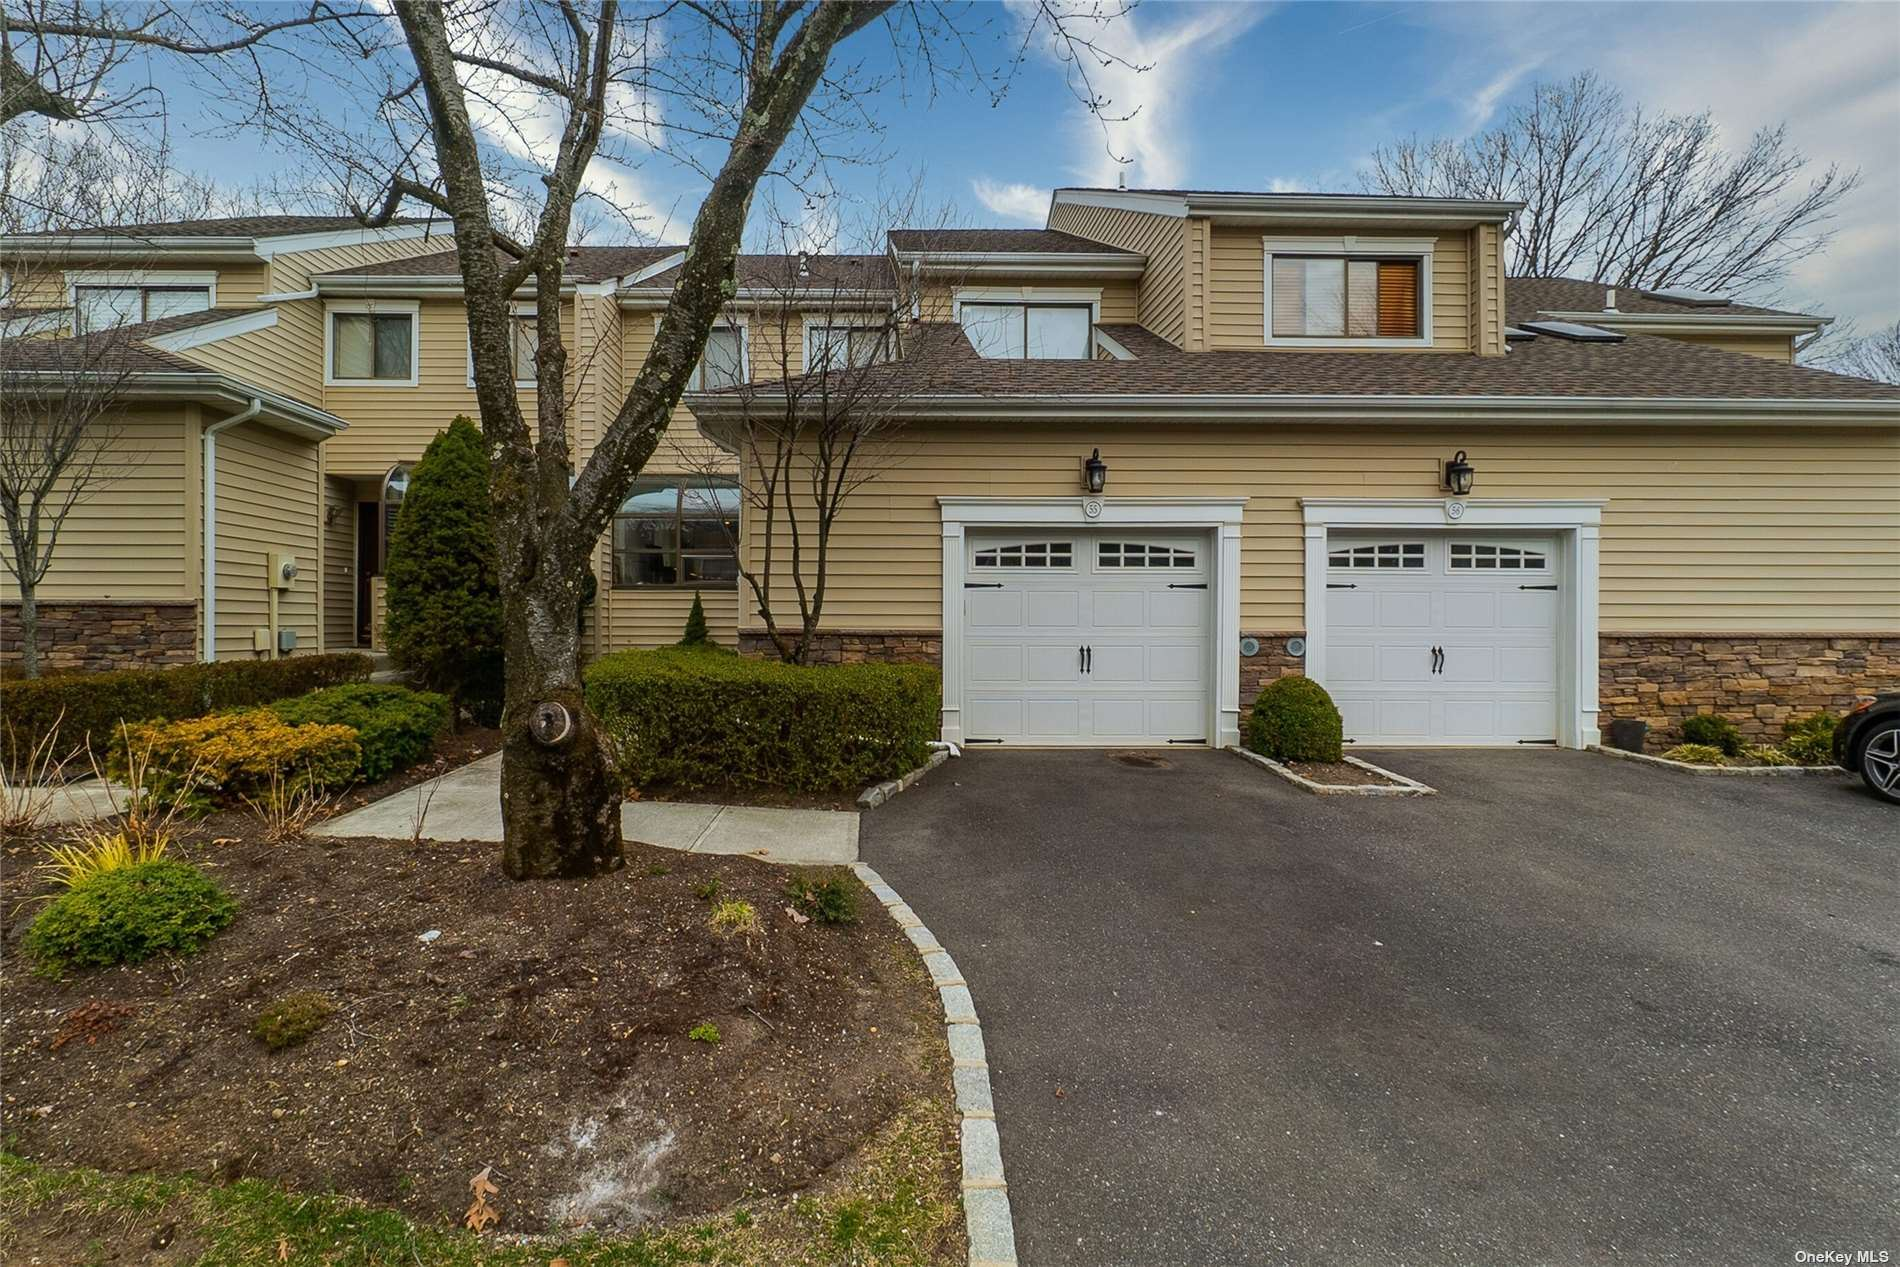 55 Villas Circle, Melville, NY 11747 - MLS#: 3298700